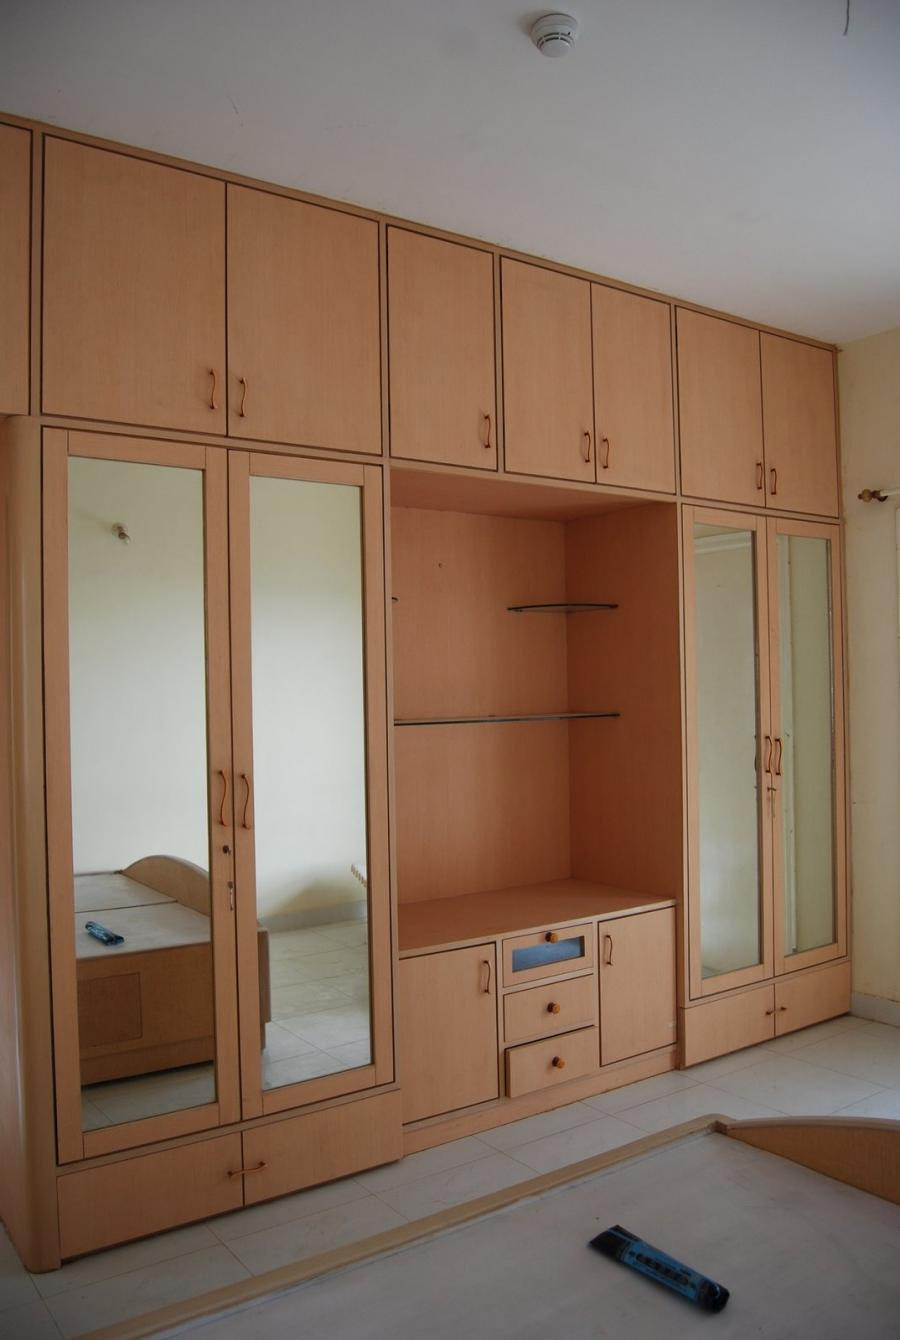 Locker Bedroom Furniture Indian Style Bedroom Furniture Uk Best Bedroom Ideas 2017